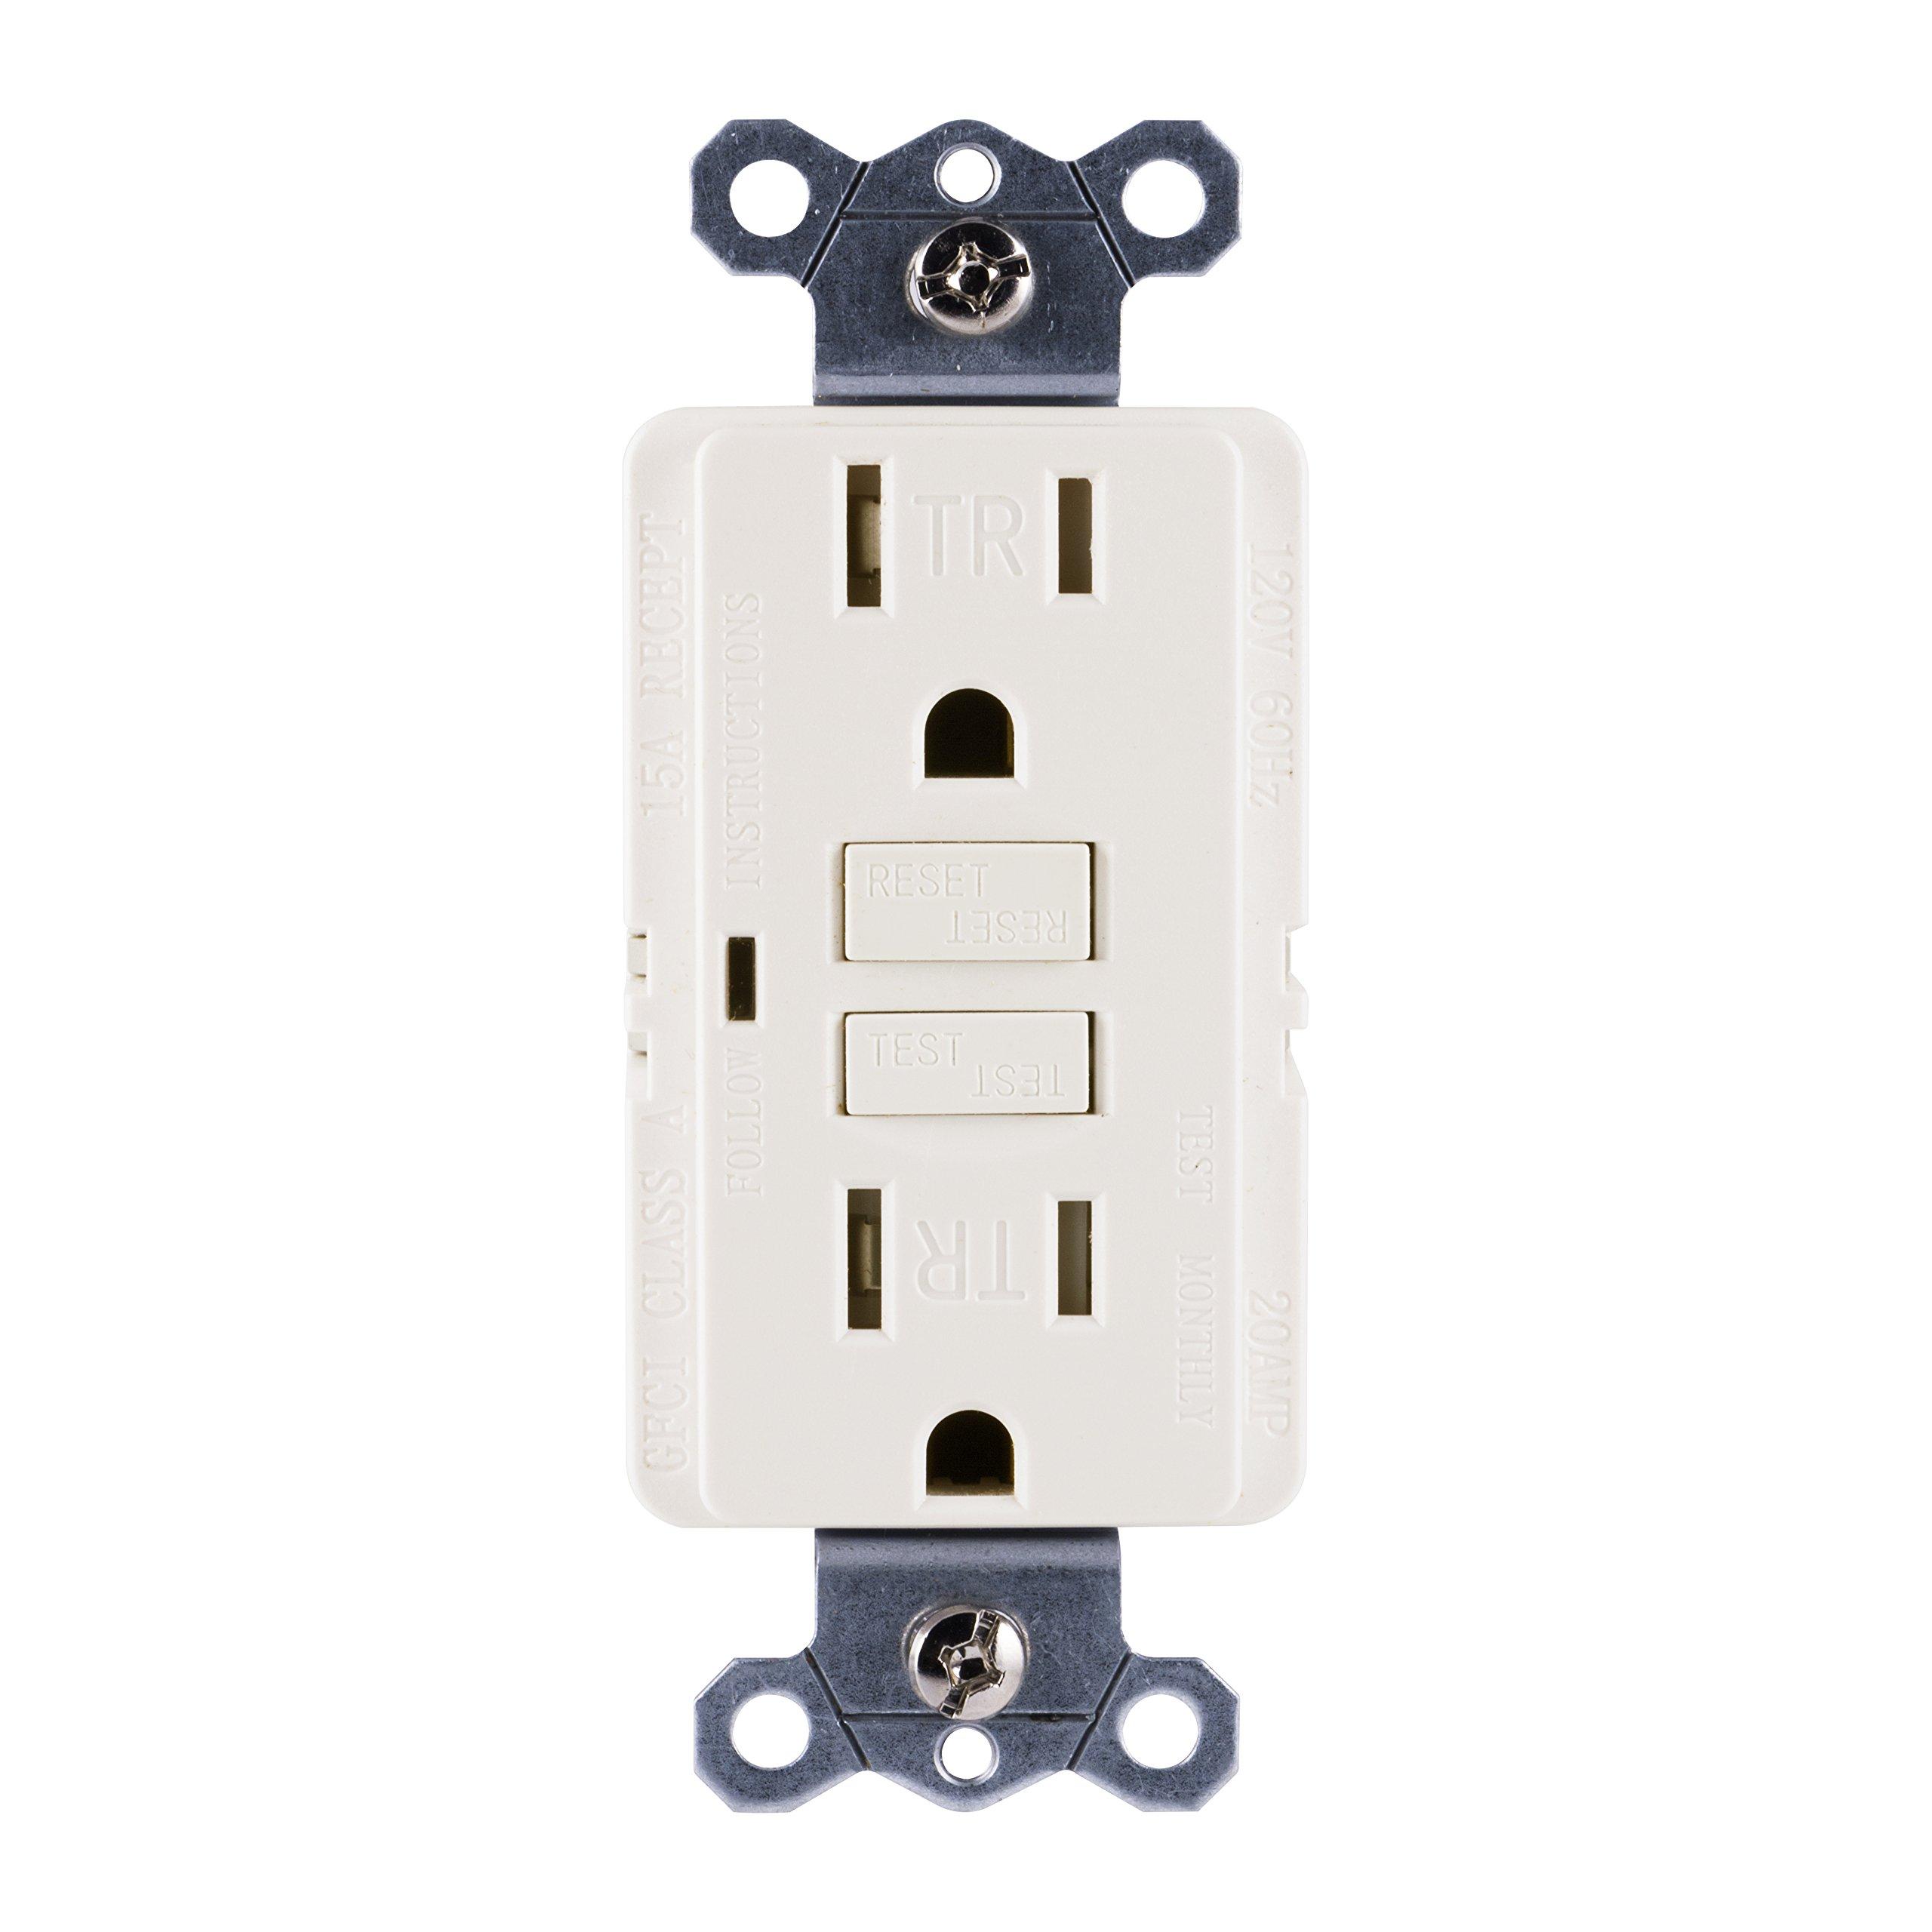 GE Tamper-Resistant GFCI Receptacle Outlet, 15-Amp 120-Volt, Light Almond, In-Wall, LED Indicator Light, UL Certified, NEC Compliant, Self-Test for Optimum Safety, 32076